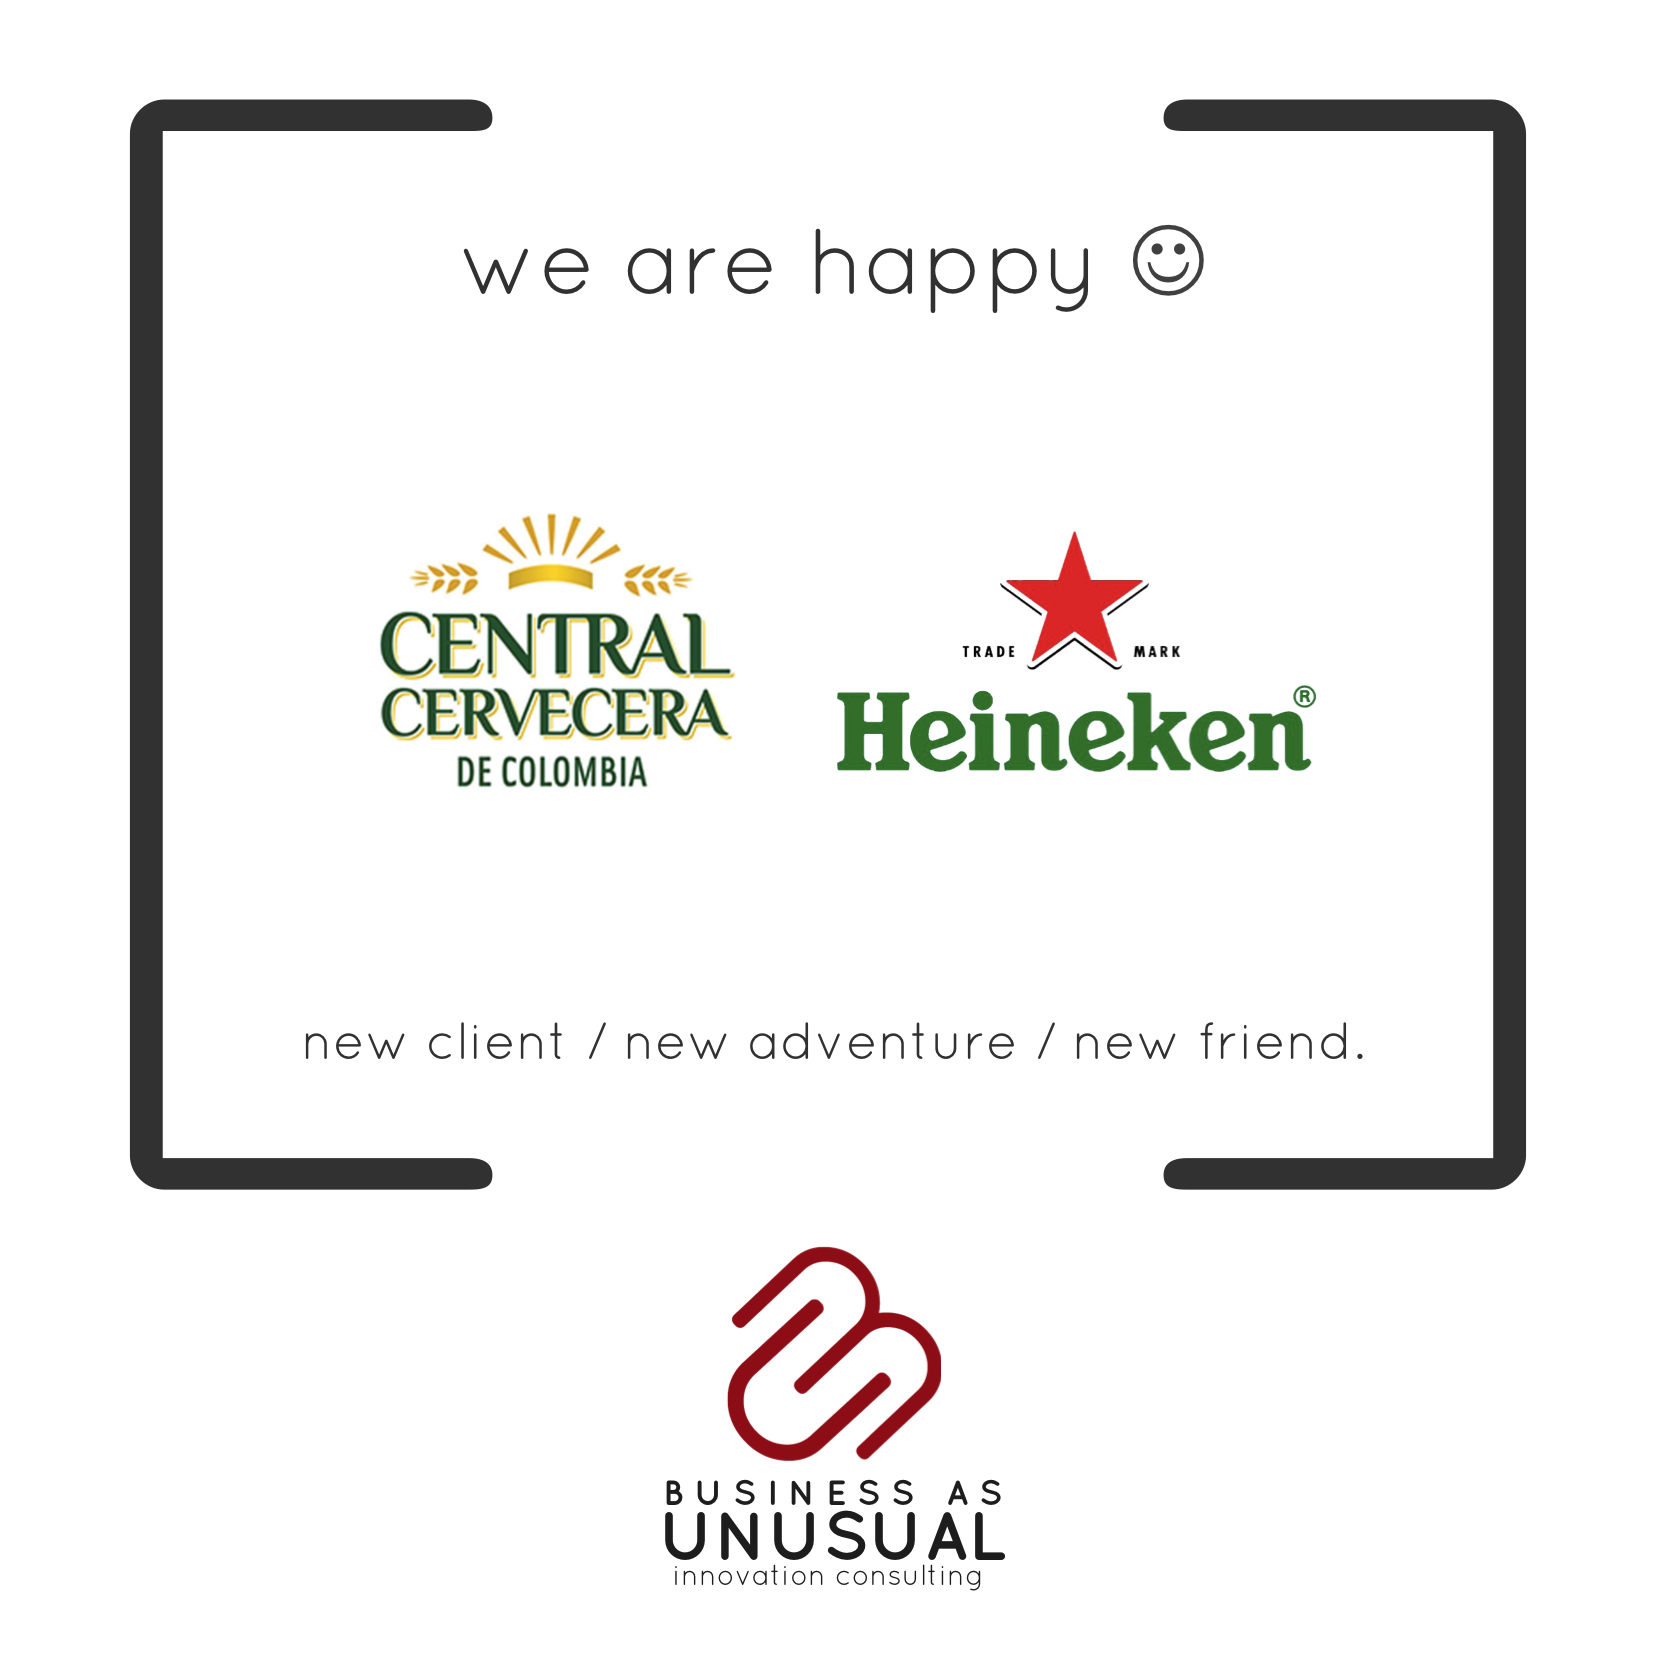 Central Cervecera de Colombia / Heineken